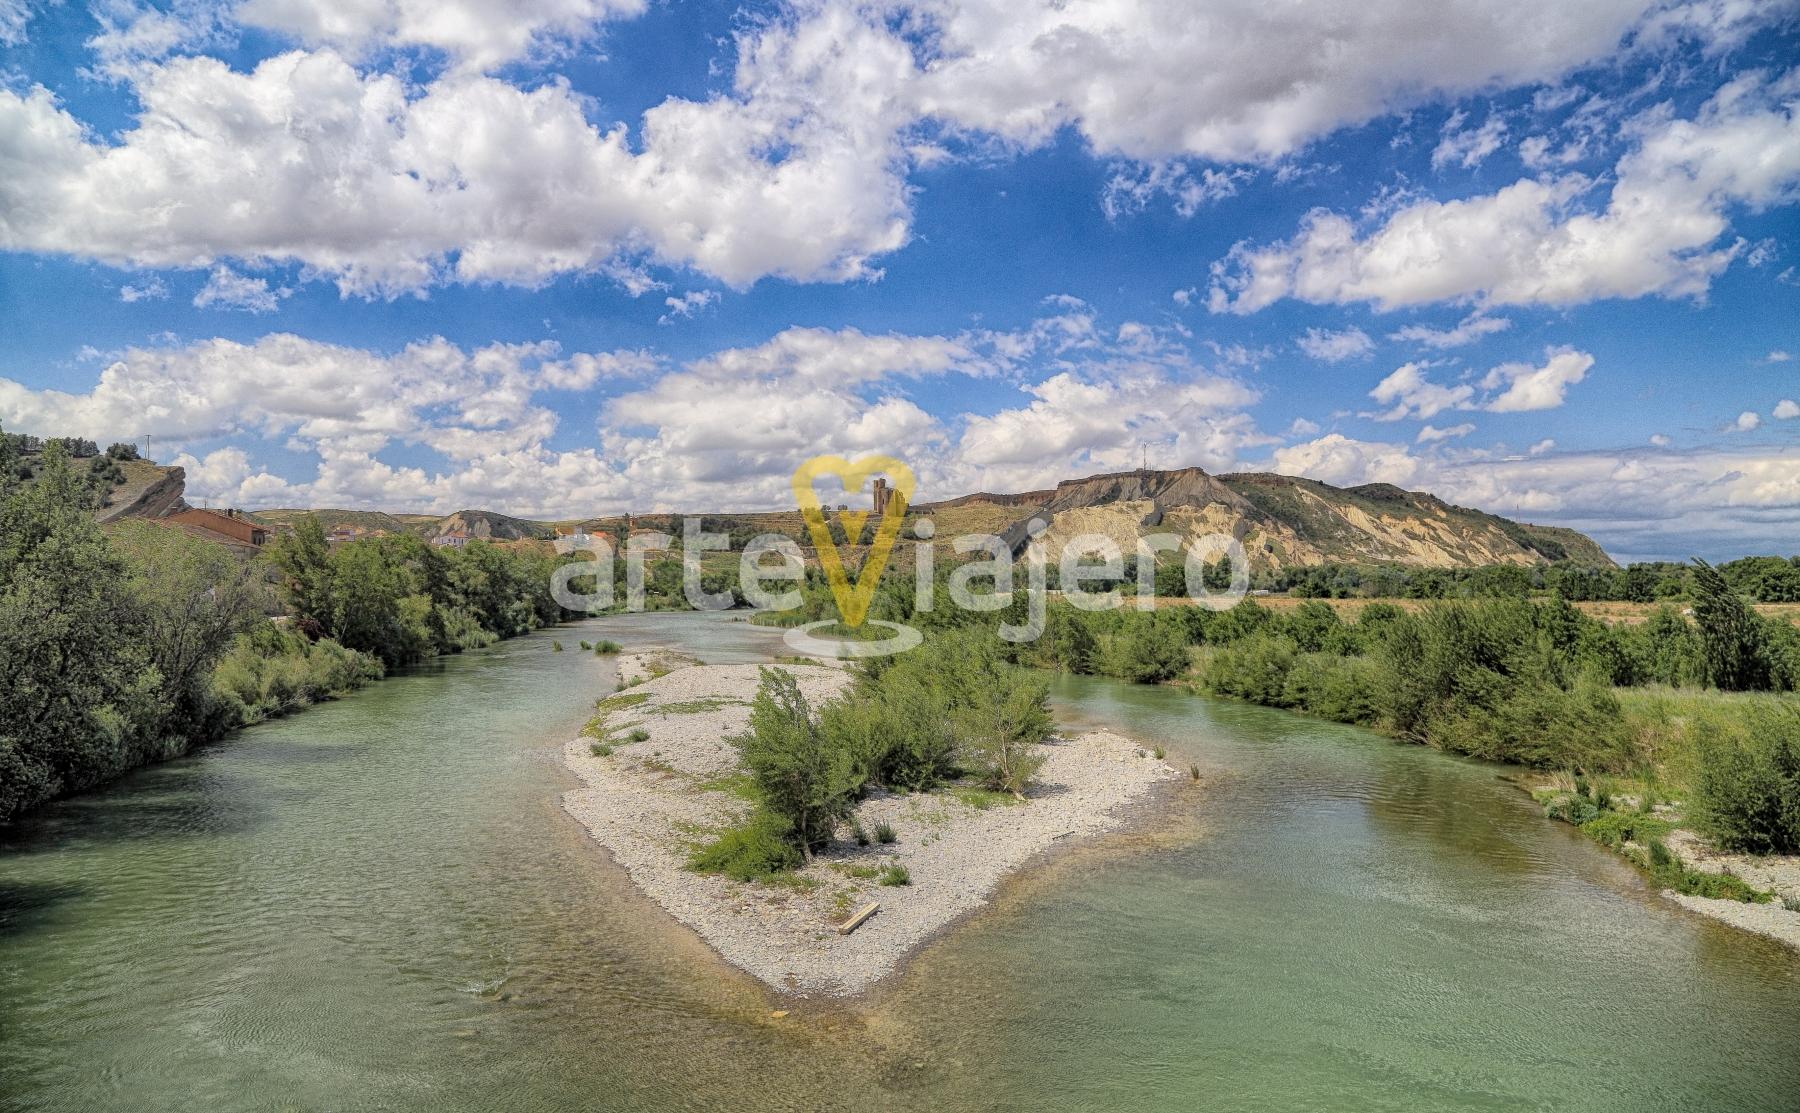 río aragón, navarra